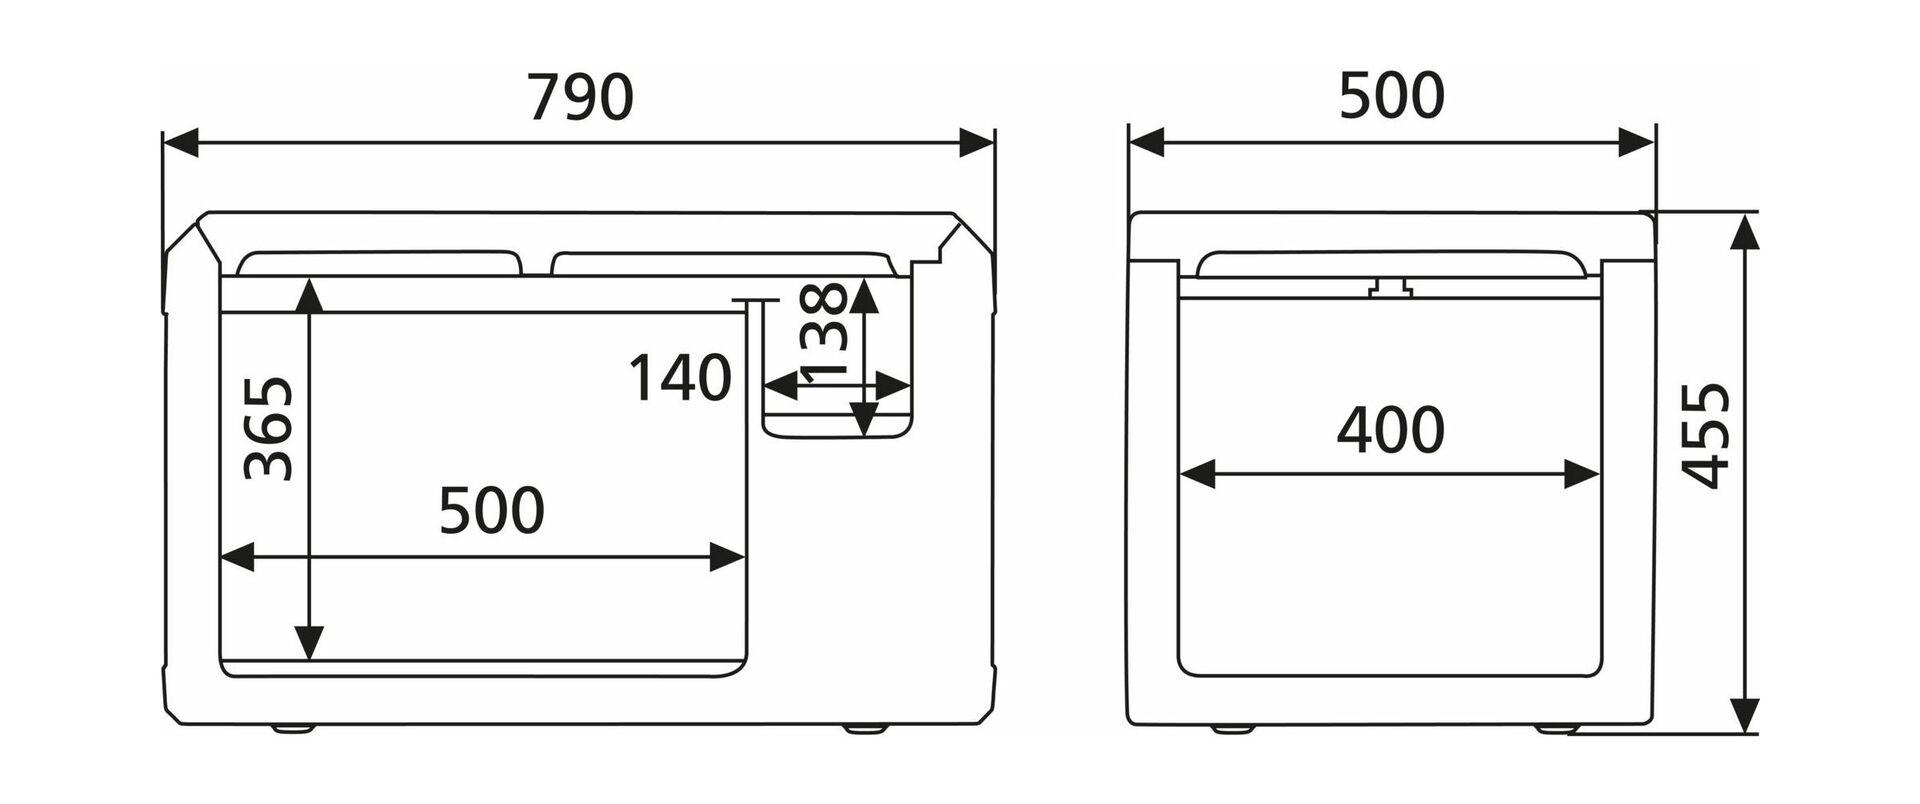 F25 Bmw Radio Wiring Diagram. Bmw. Auto Wiring Diagram